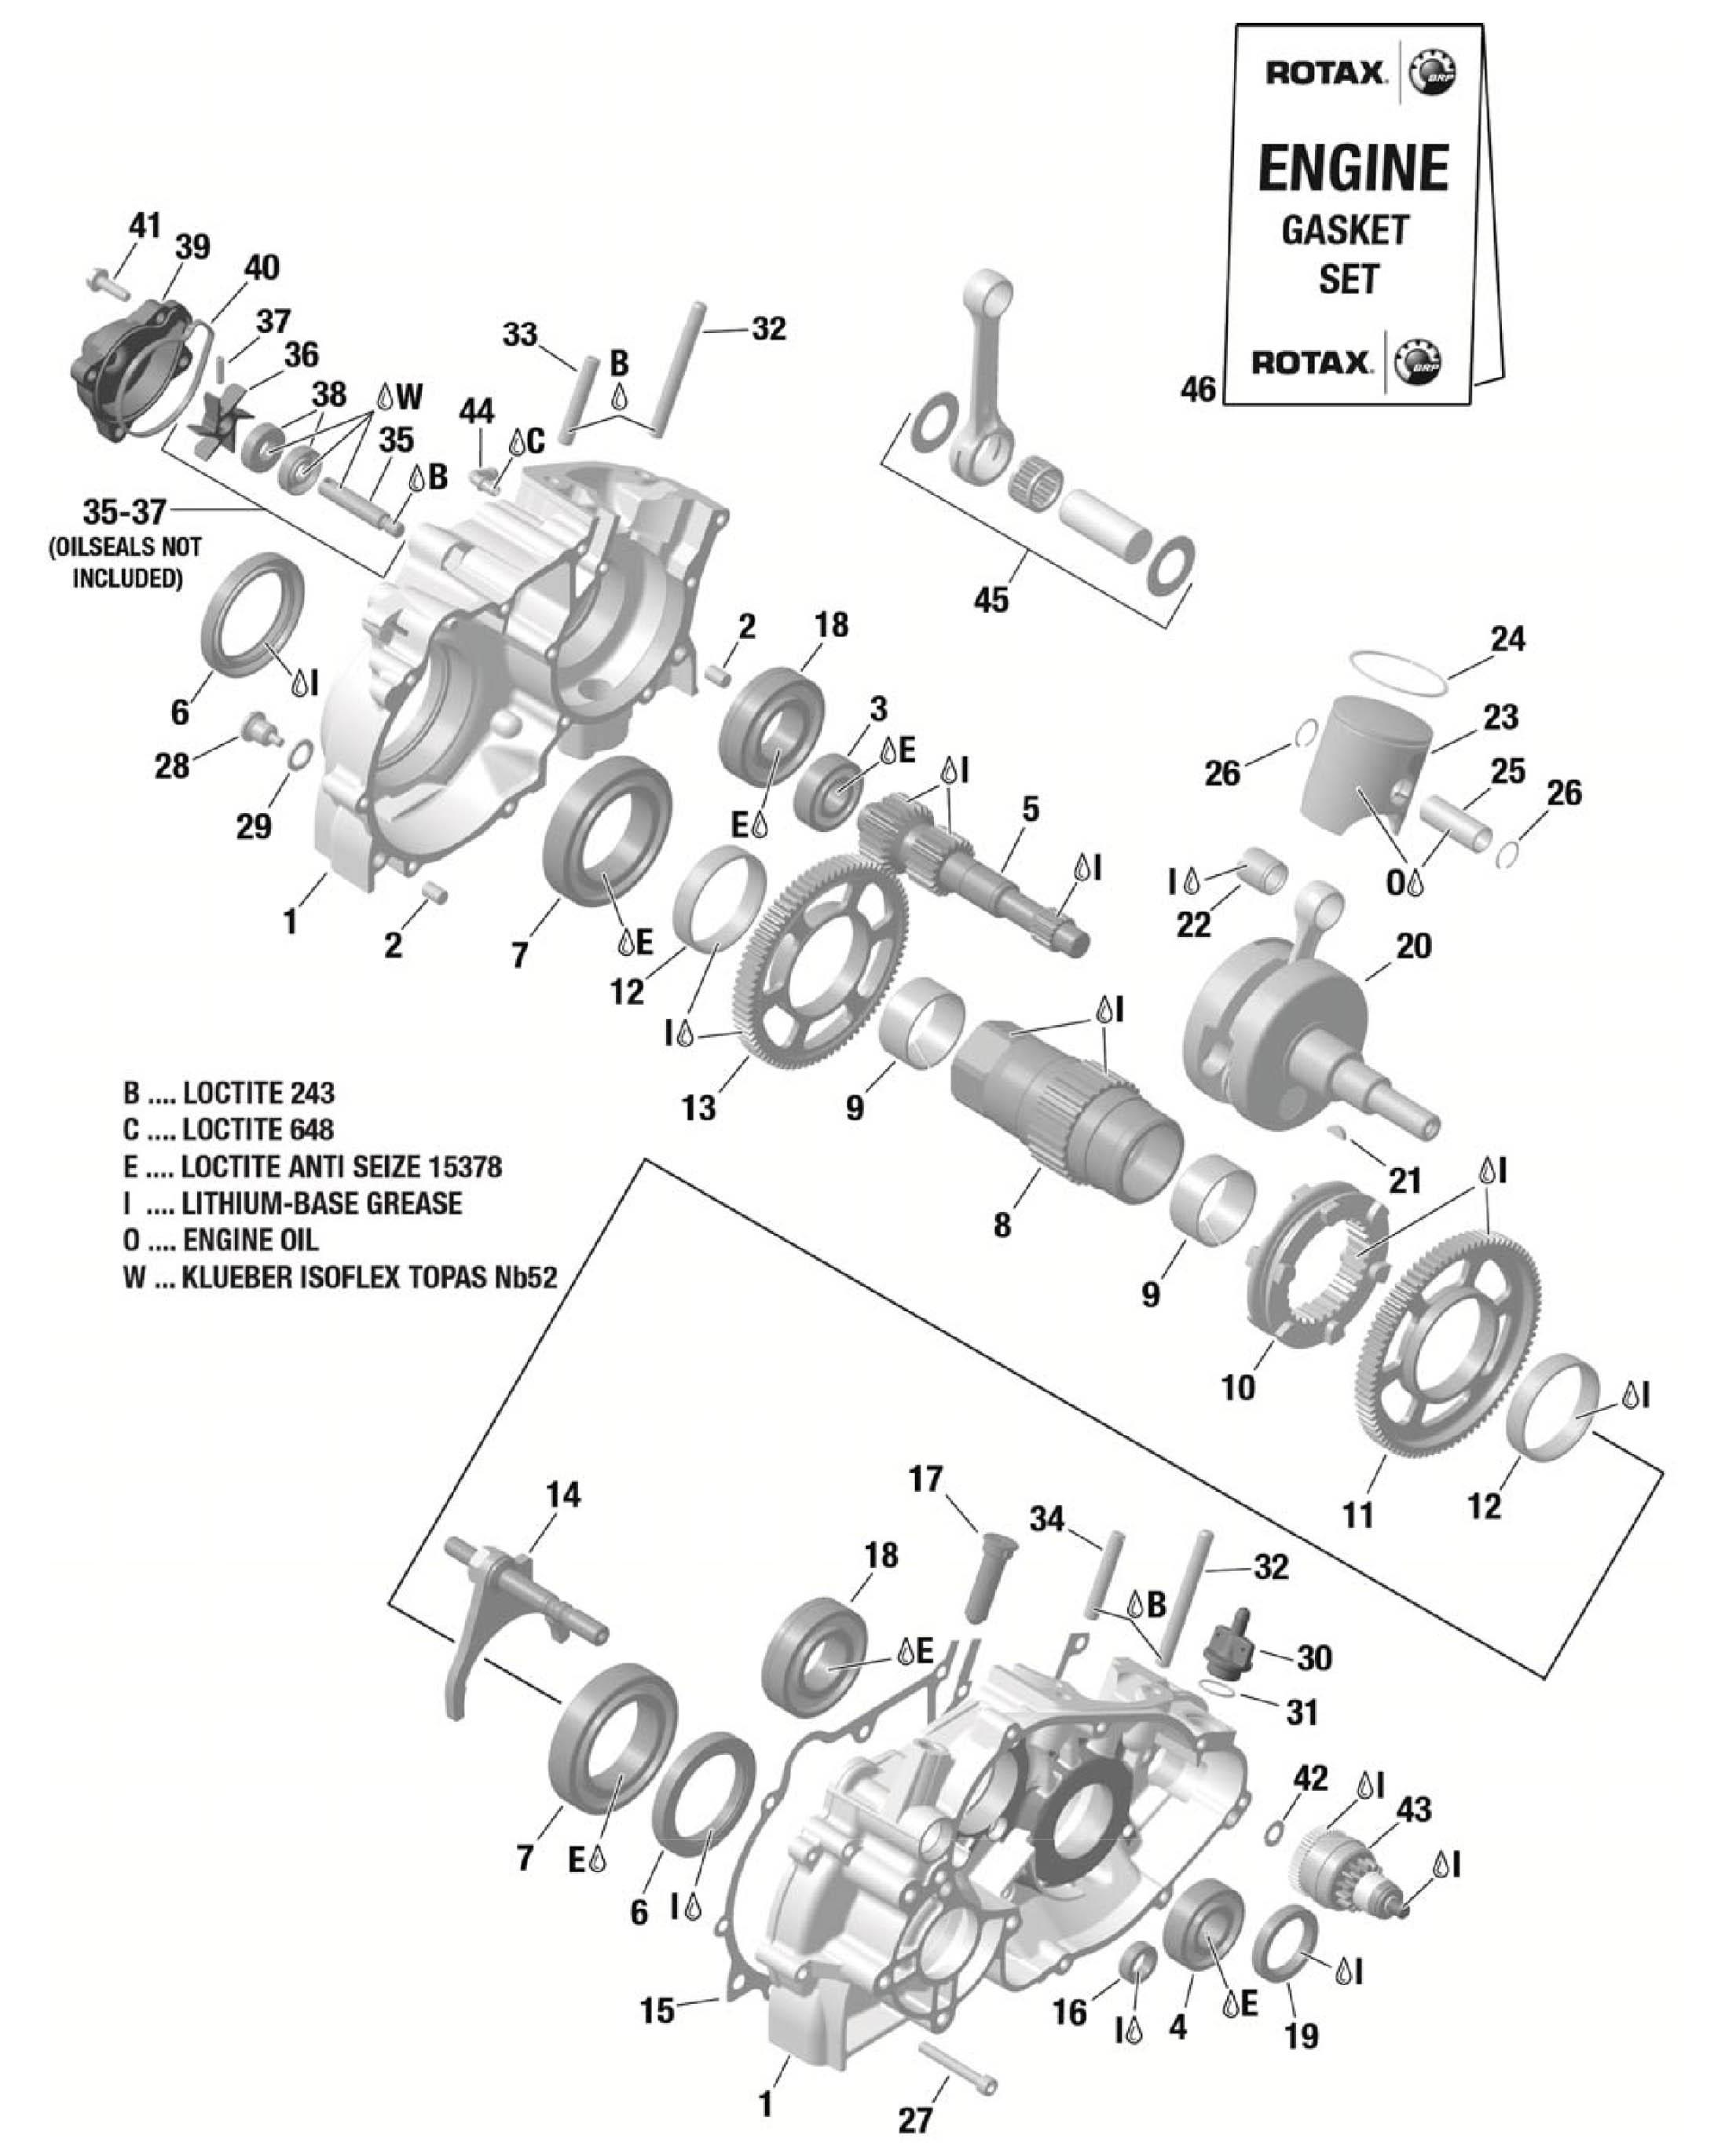 Crankcase Phil Giebler Racing Store Rotax Engine Diagram Price Desc